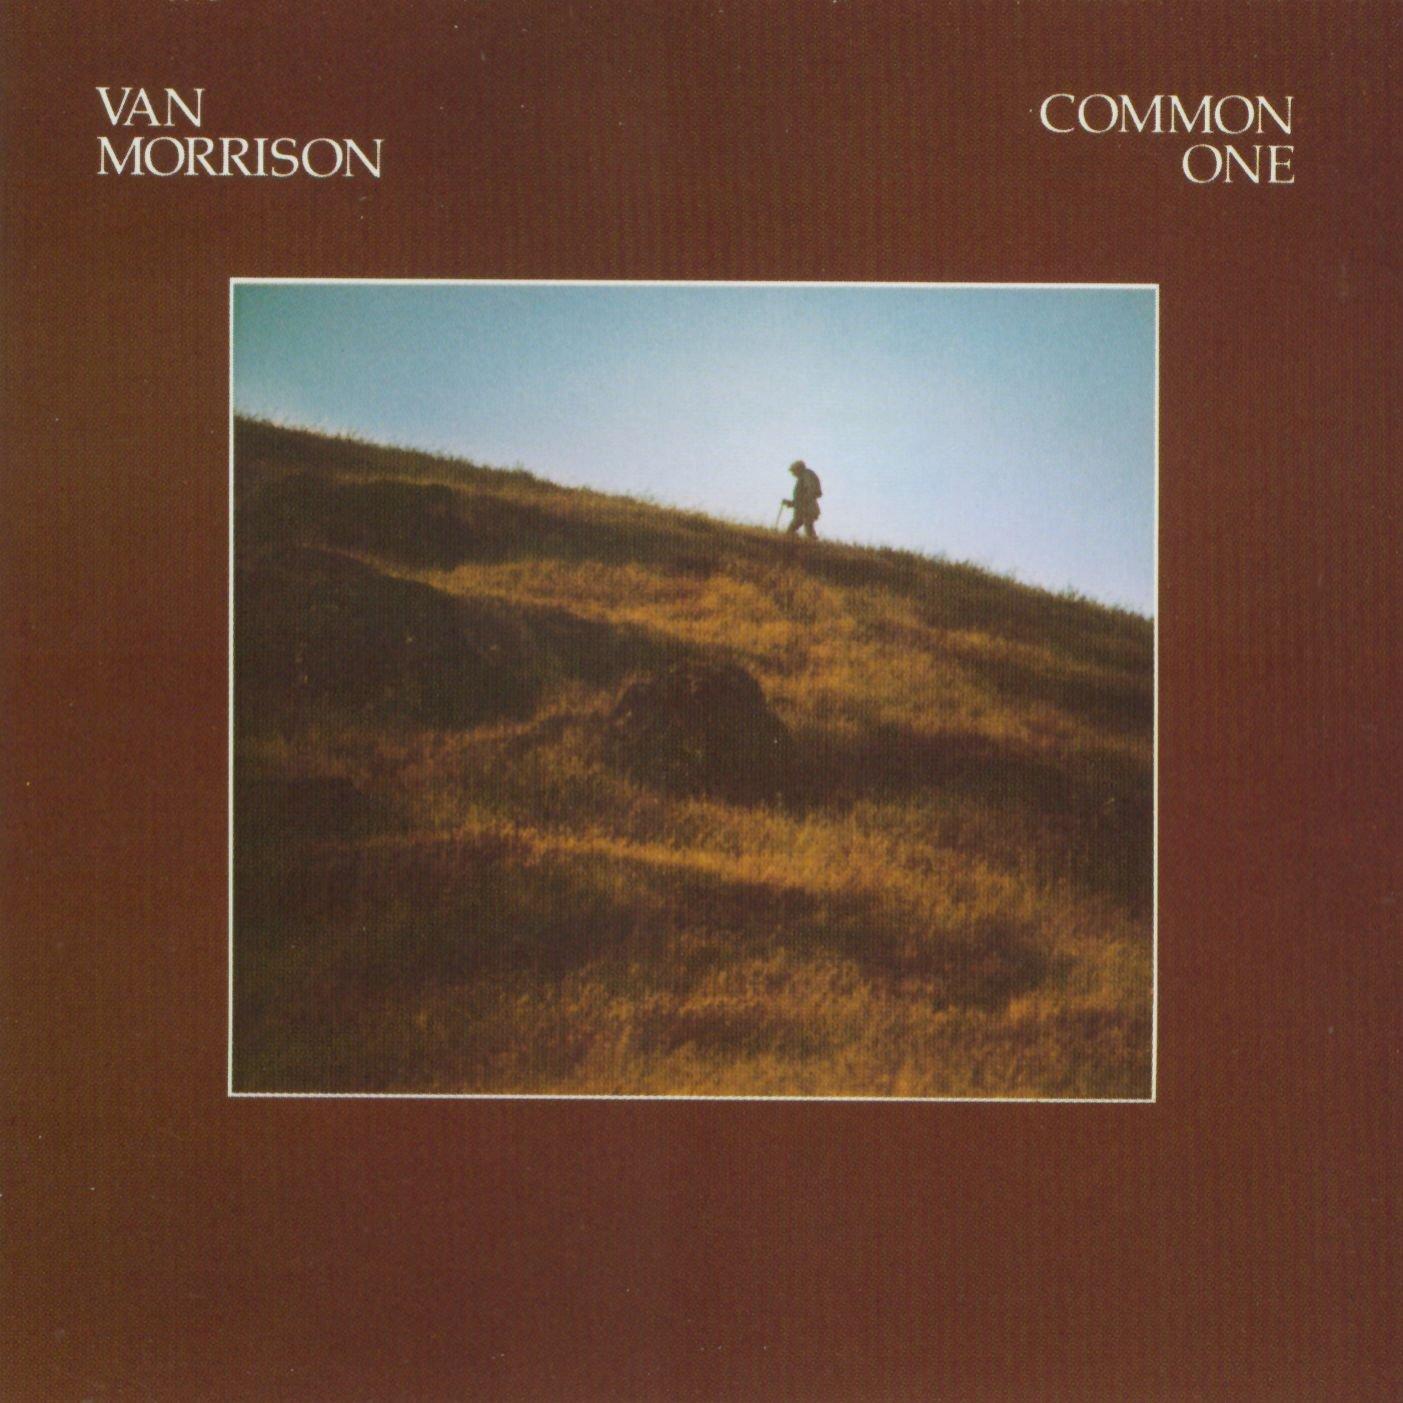 CD : Van Morrison - Common One (CD)